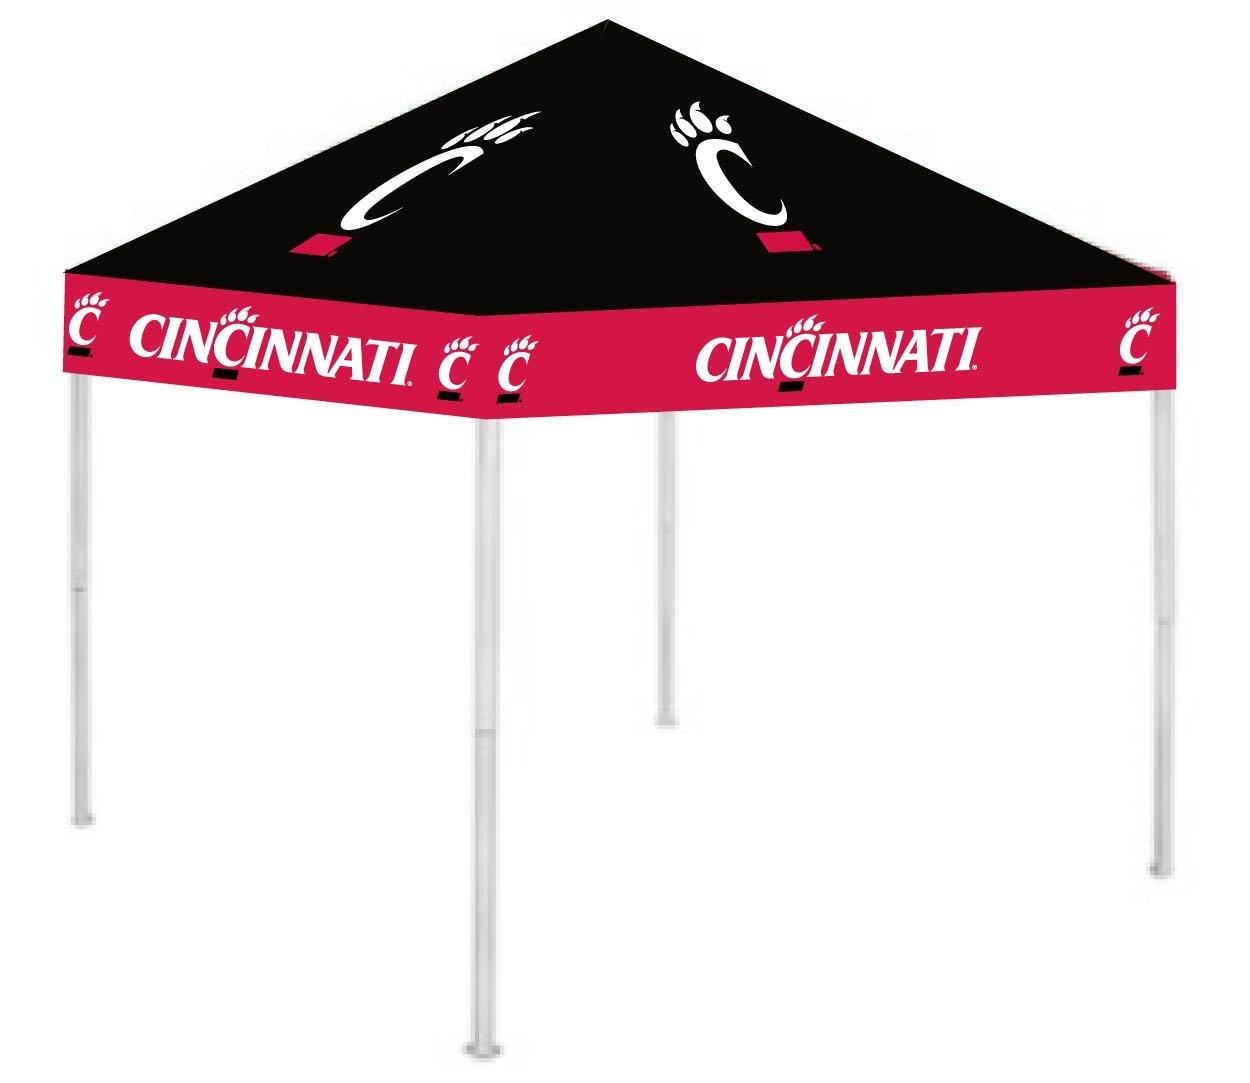 Rivalry RV156-5000 9' x 9' Cincinnati Canopy B003XKISF8 9 x 9|Cincinnati Bearcats Cincinnati Bearcats 9 x 9